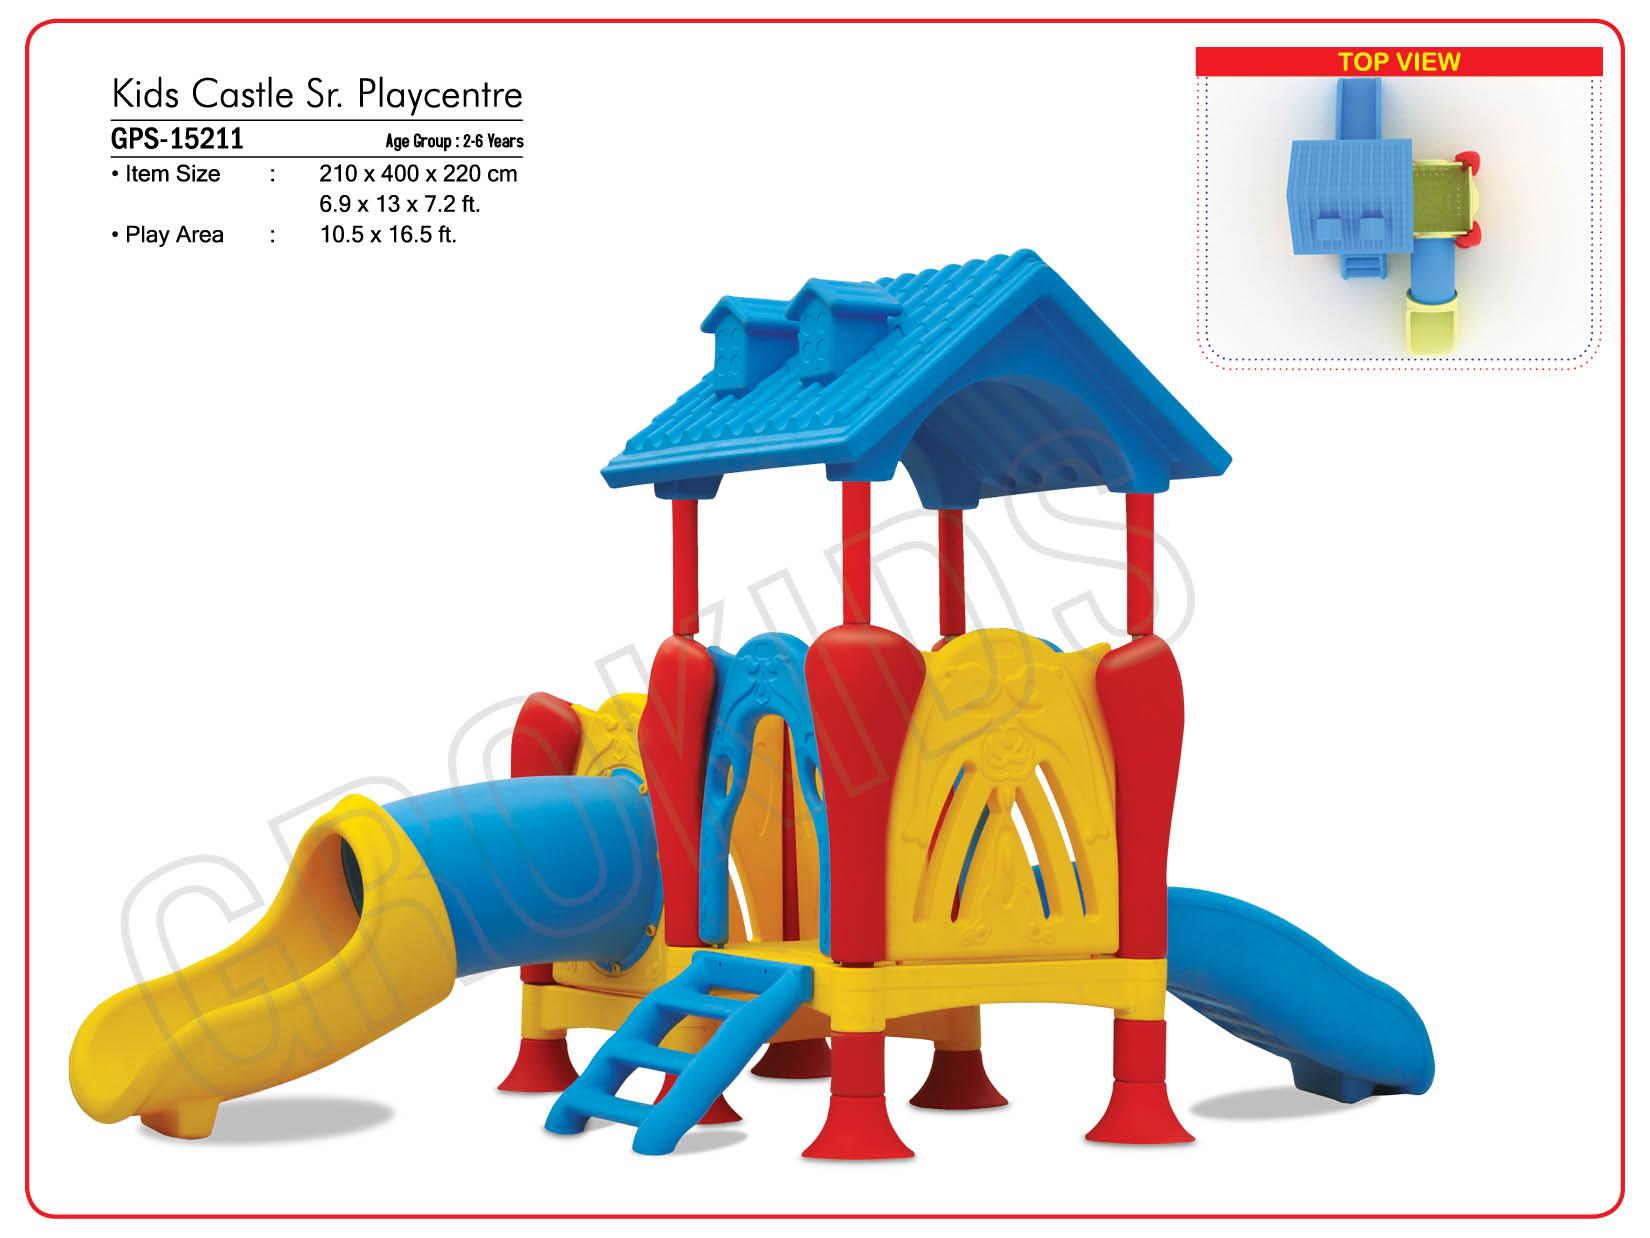 Kids Castle Sr Playcentre Outdoor Station Kidzeduzone